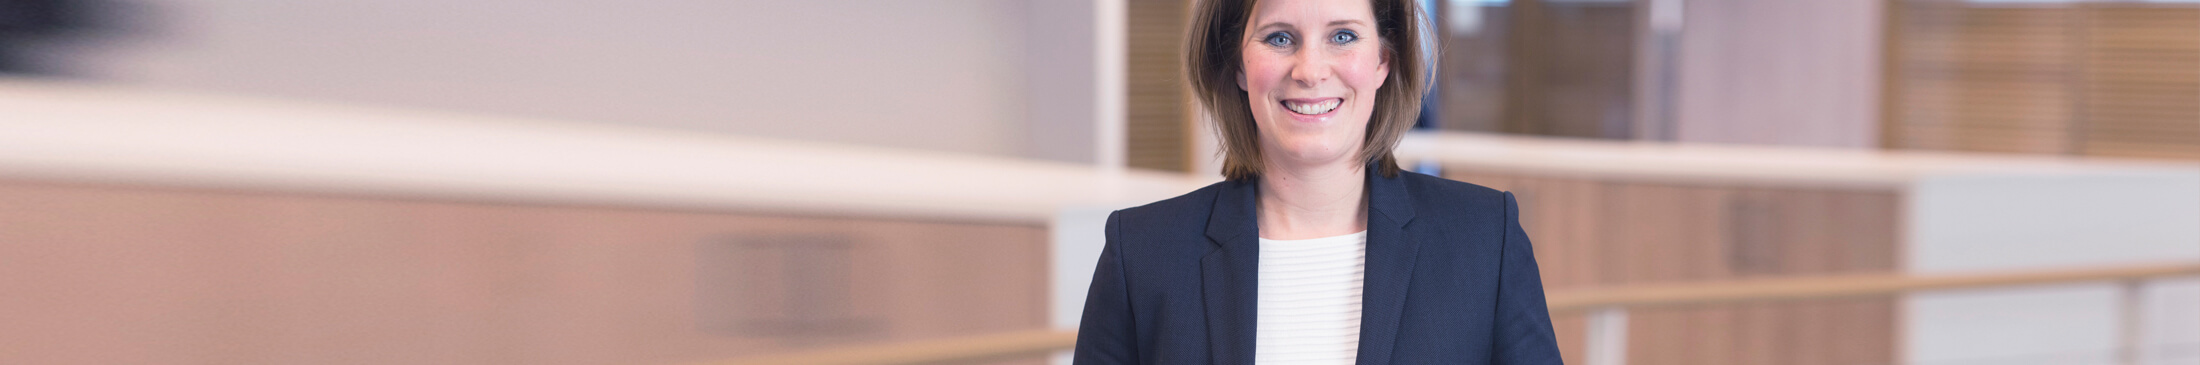 Madelon Beljaars letselschadeadvocaat MannaertsAppels Tilburg Breda